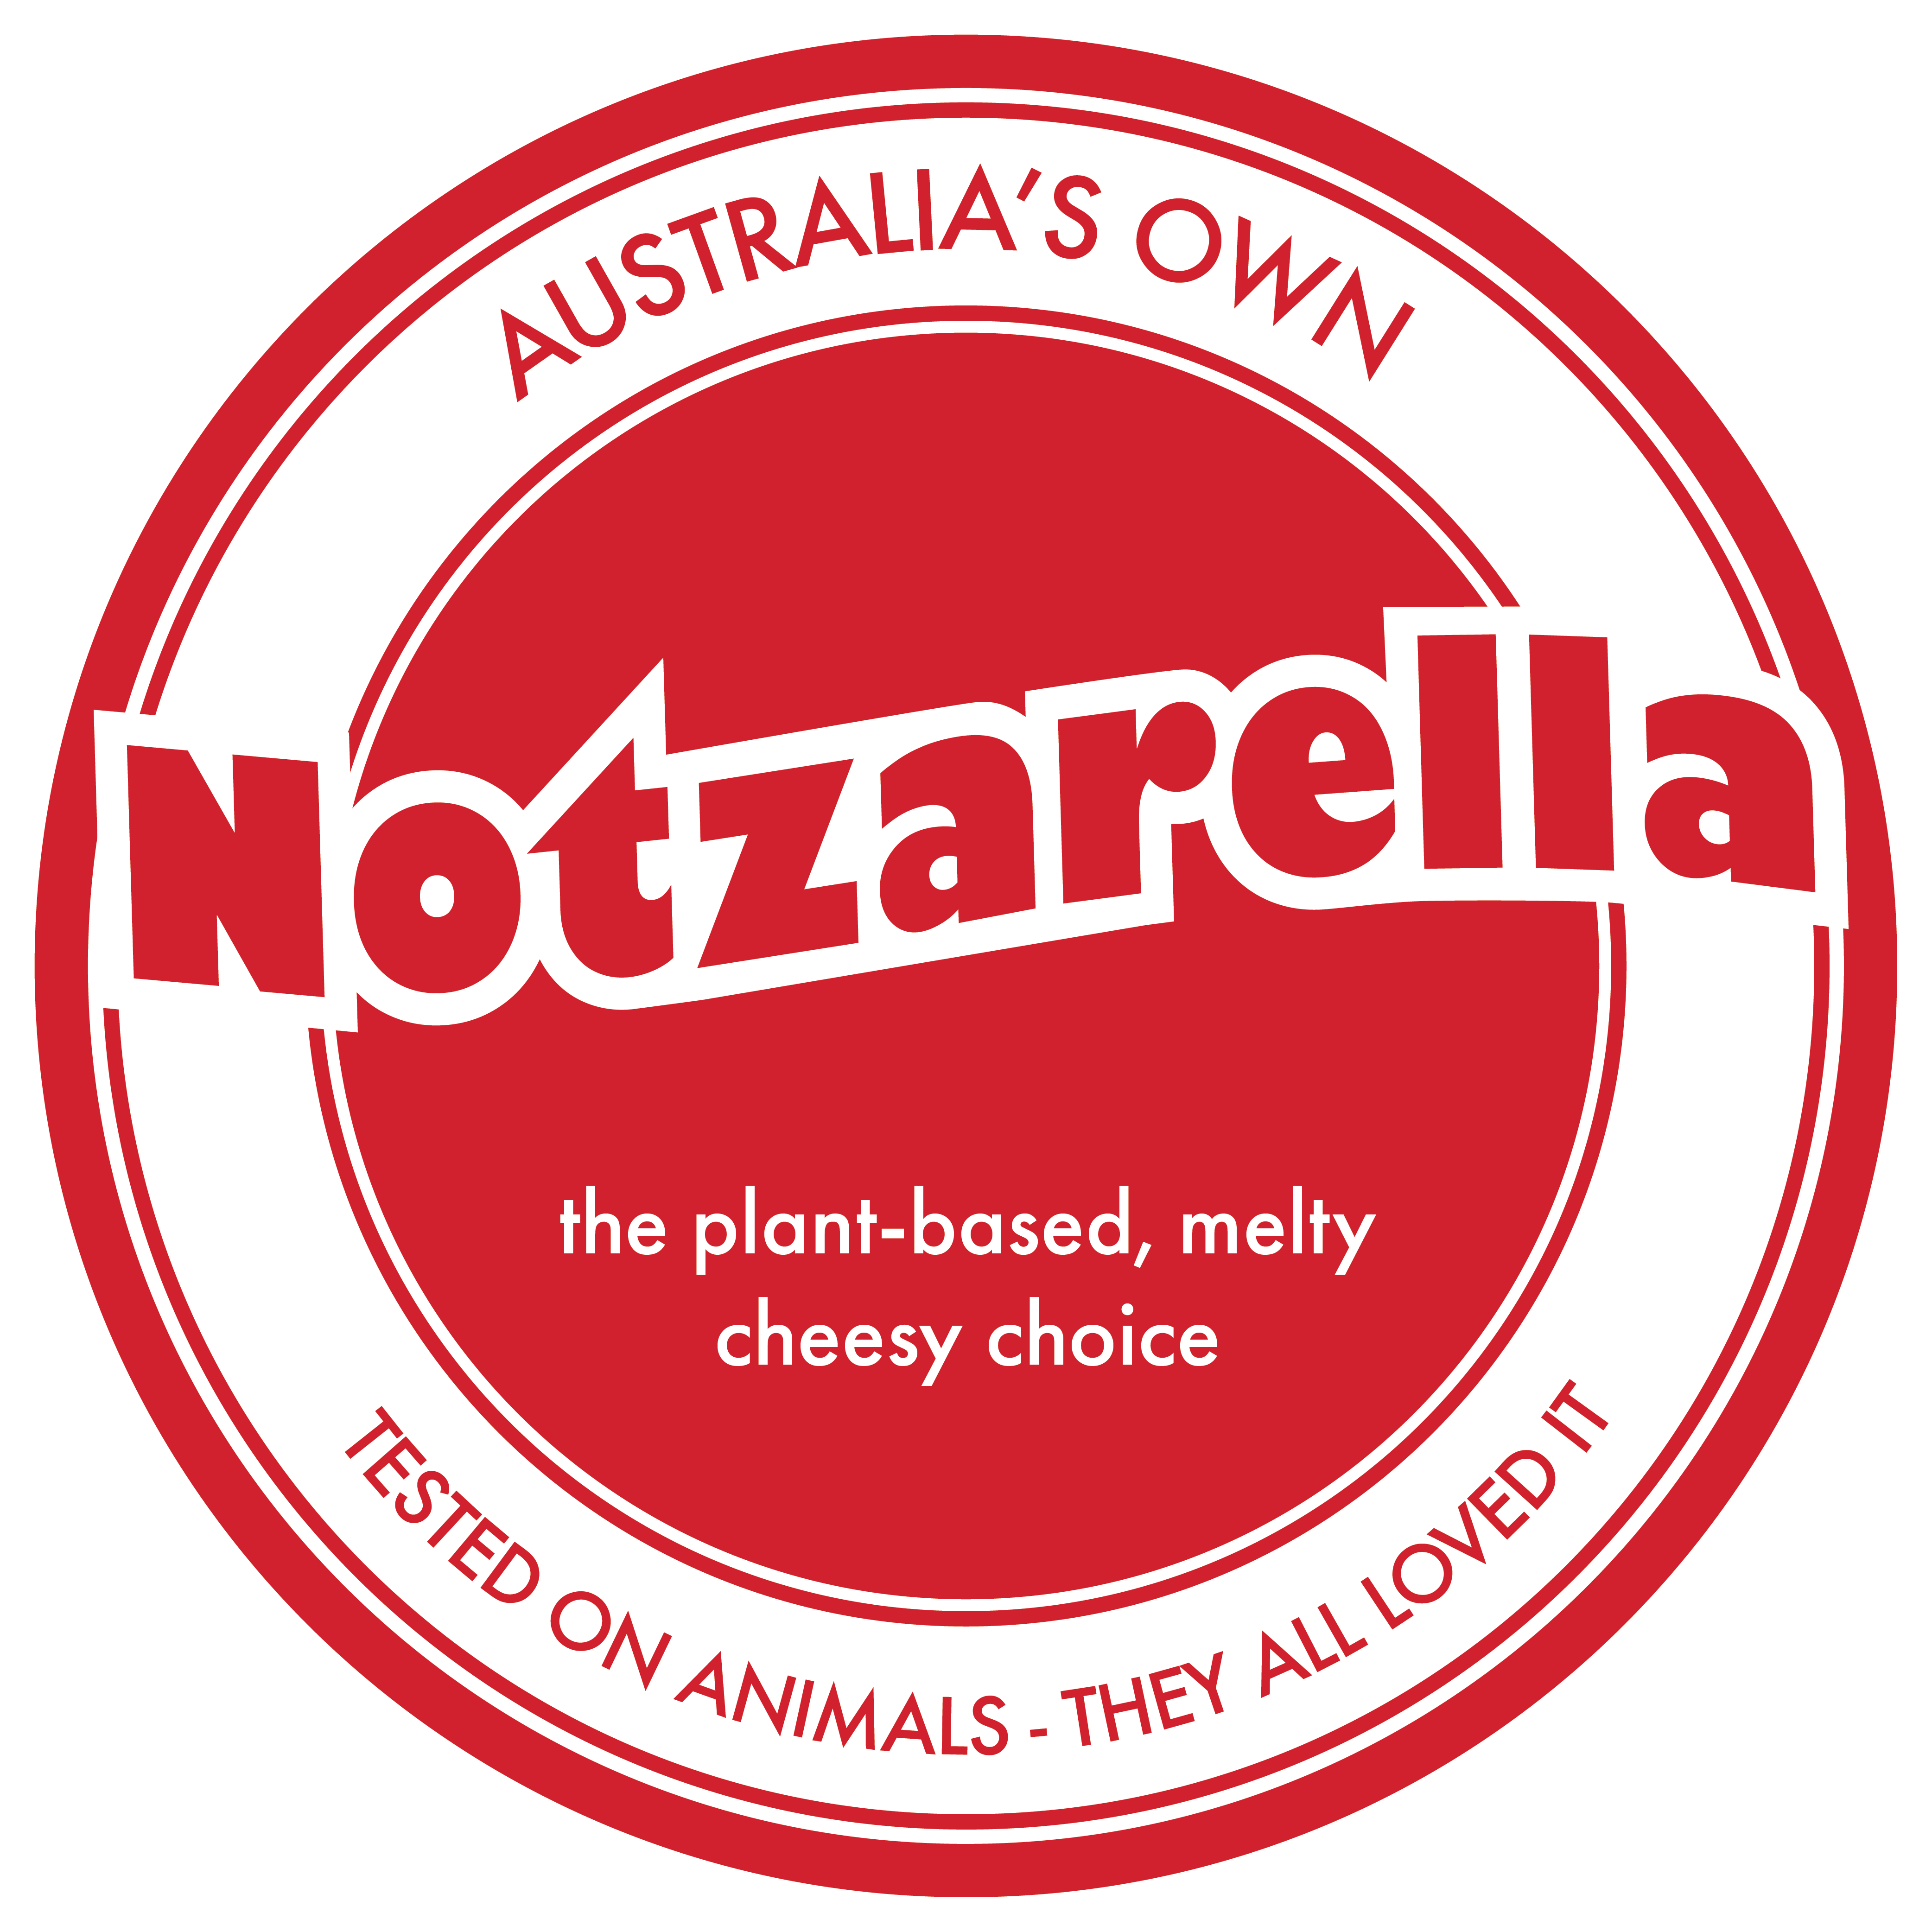 Notzarella